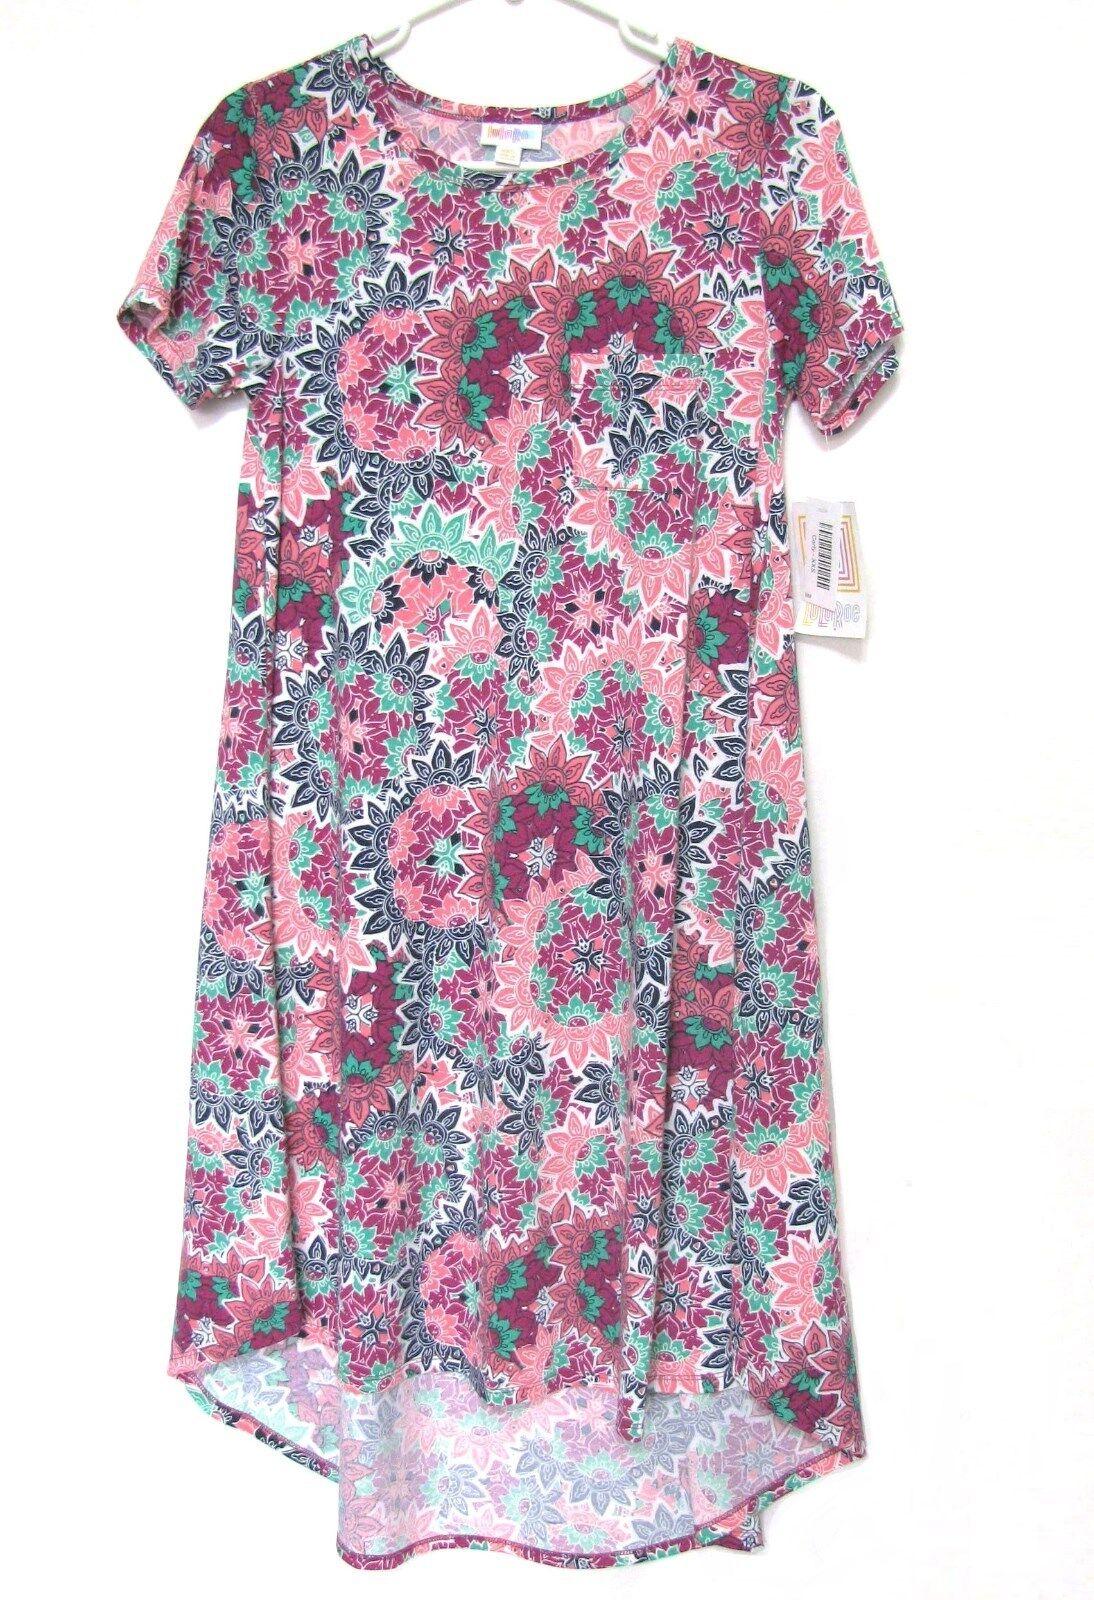 bafc4e97f0ec7 NWT LulaRoe Carly Swing Dress XXS Pink Teal Geometric Floral Unicorn Hi-Low  2XS